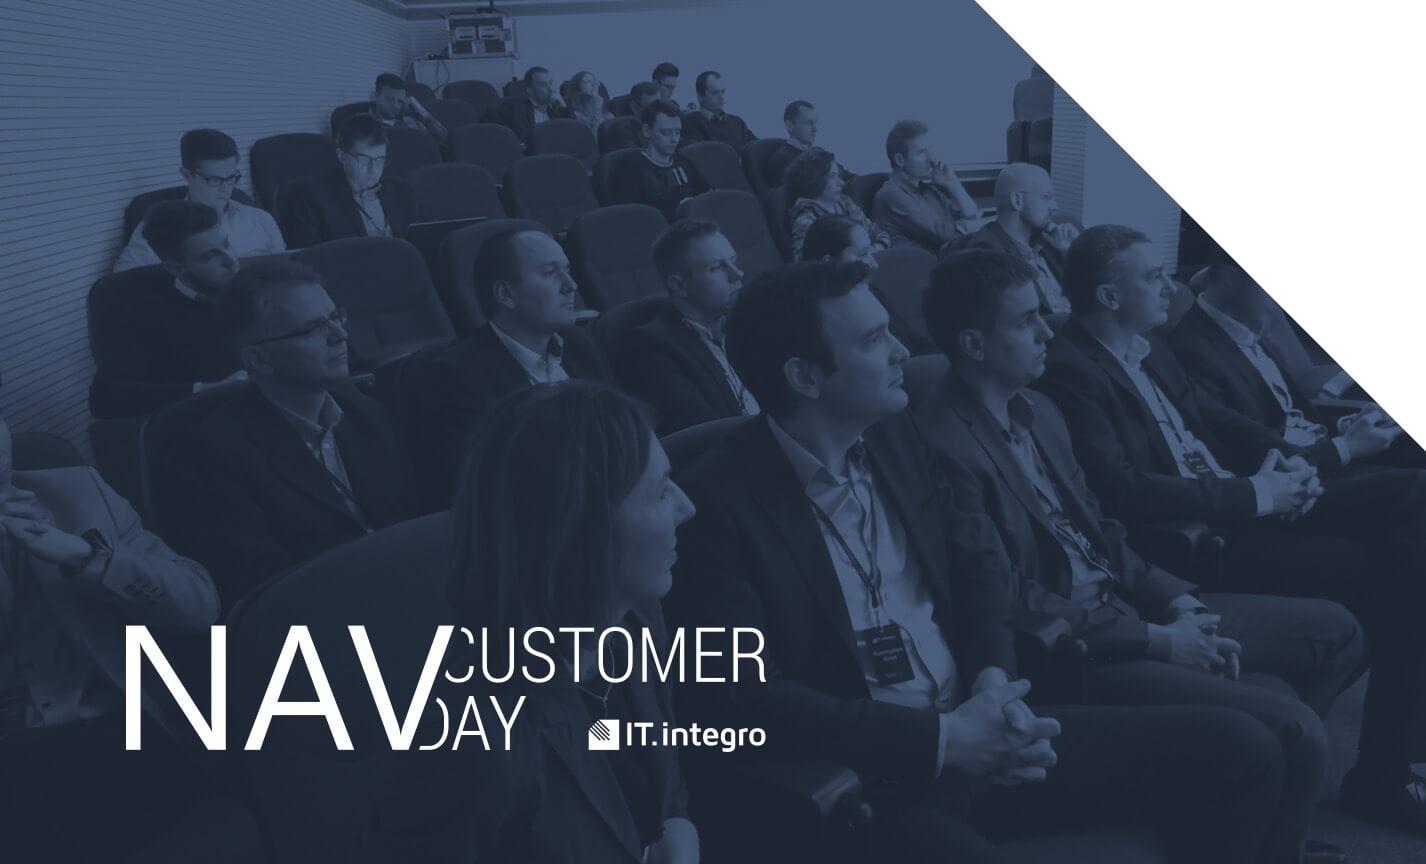 NAV Customer Day